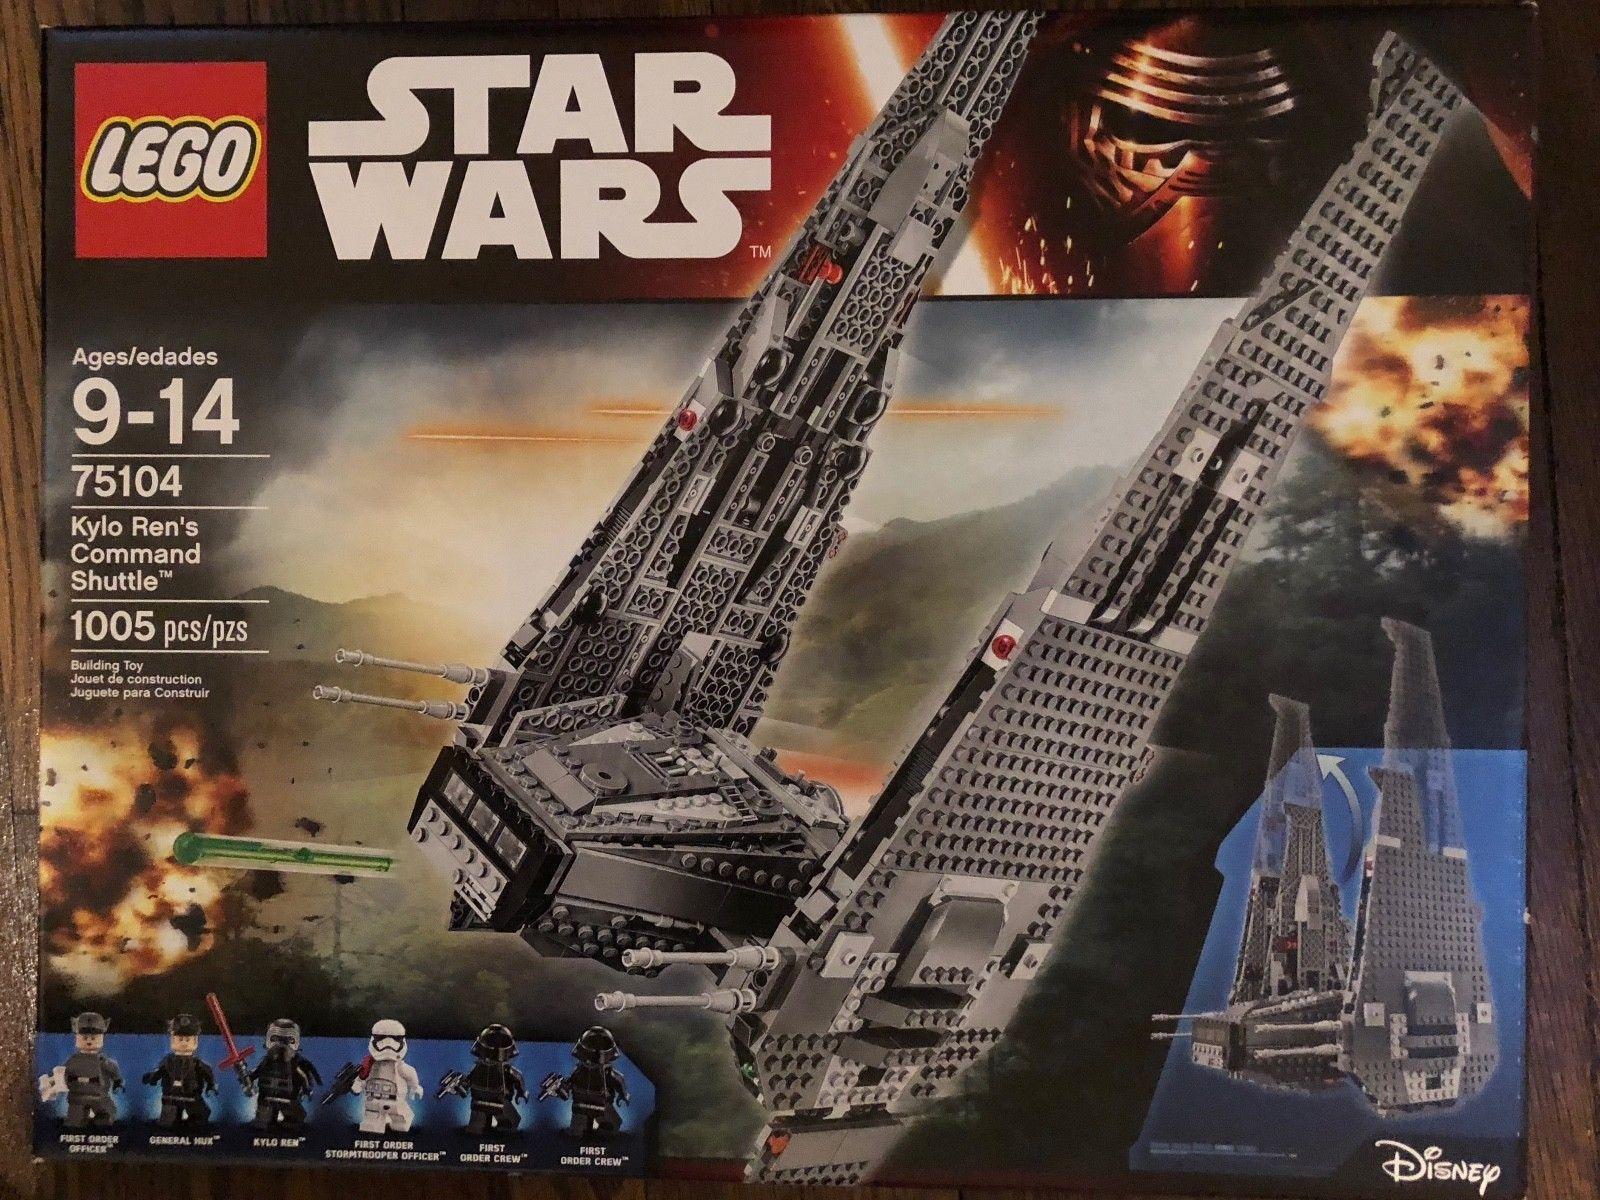 Lego Star Wars Kylo Ren S Command Shuttle 75104 New In Box Kylo Ren Command Shuttle Star Wars Kylo Ren Lego Star Wars